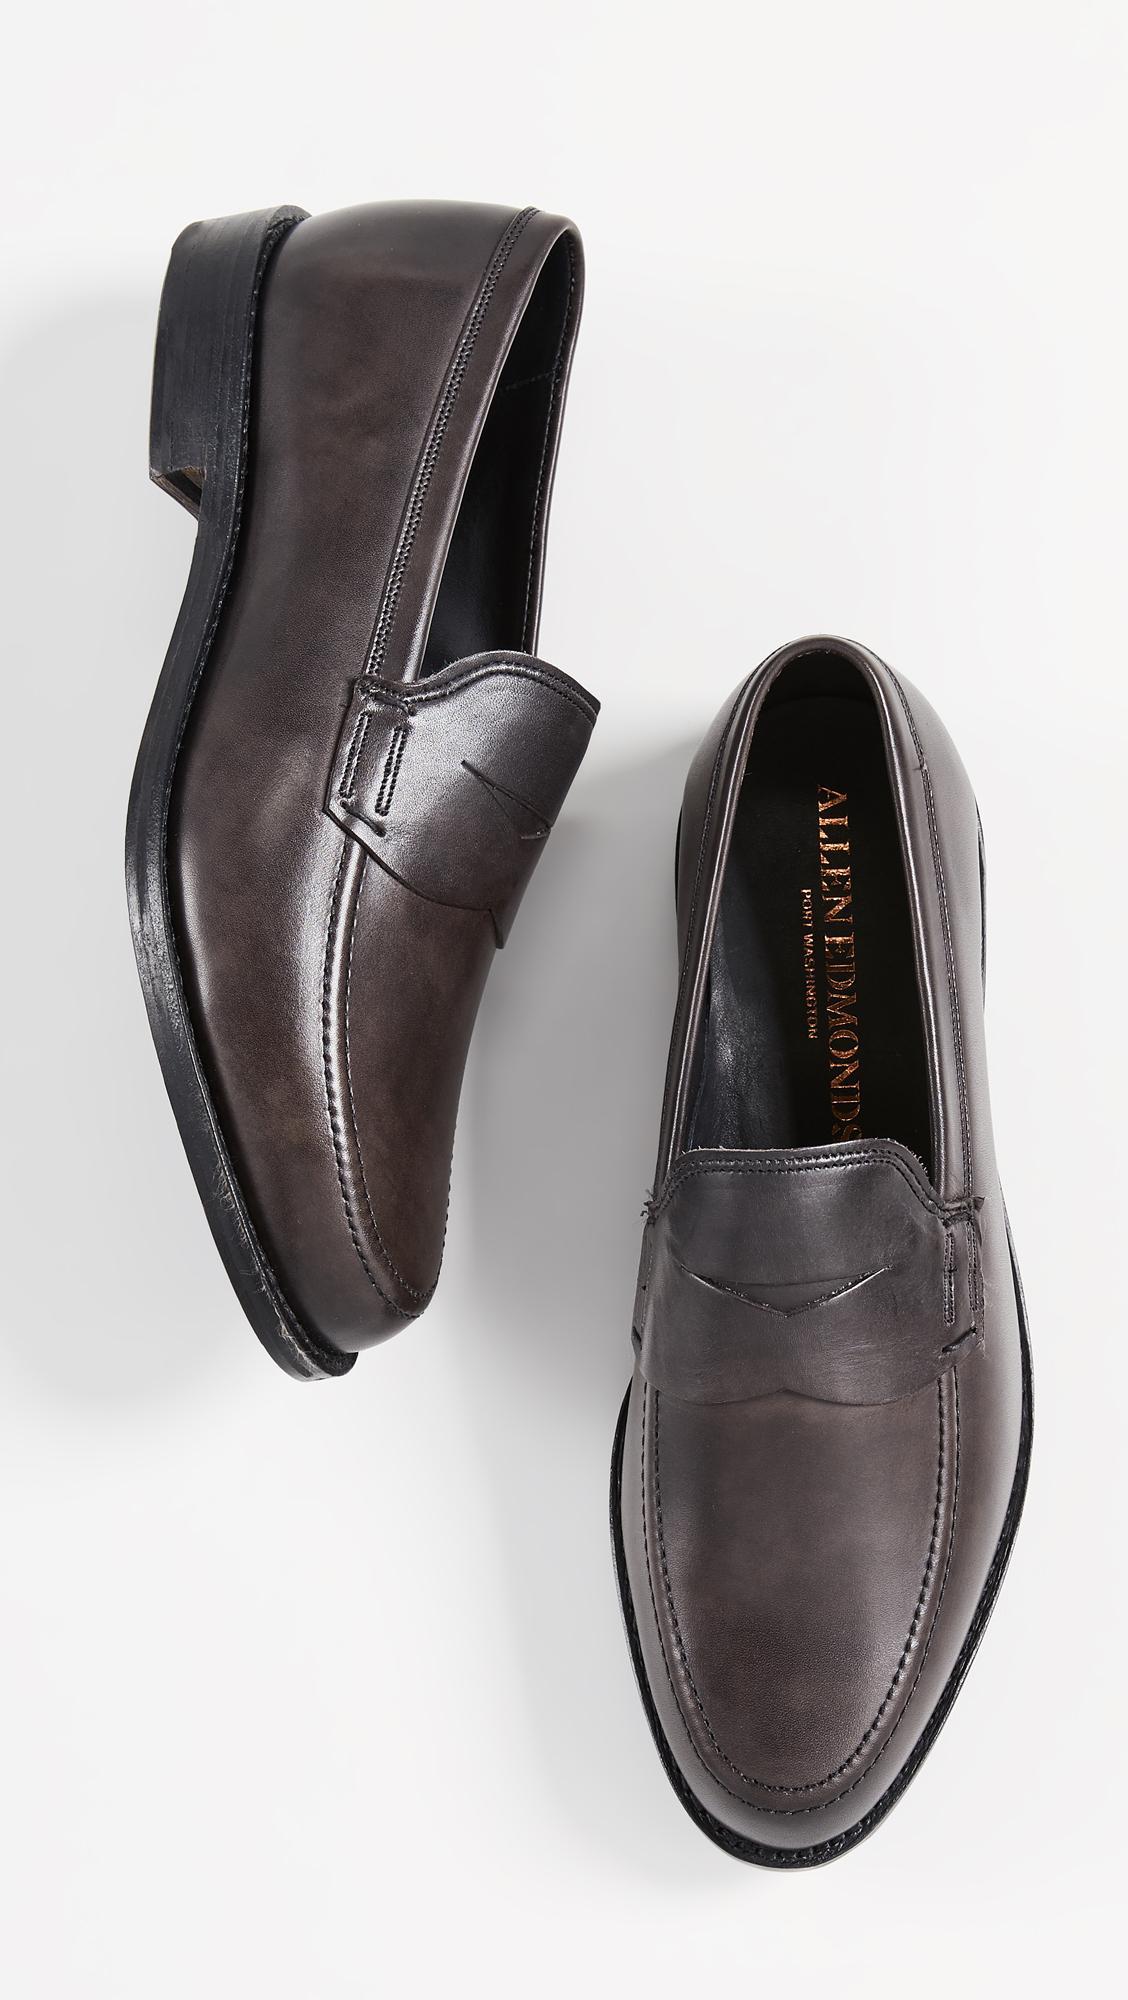 f9fcbb54e37 Allen Edmonds - Black Wooster Loafers for Men - Lyst. View fullscreen